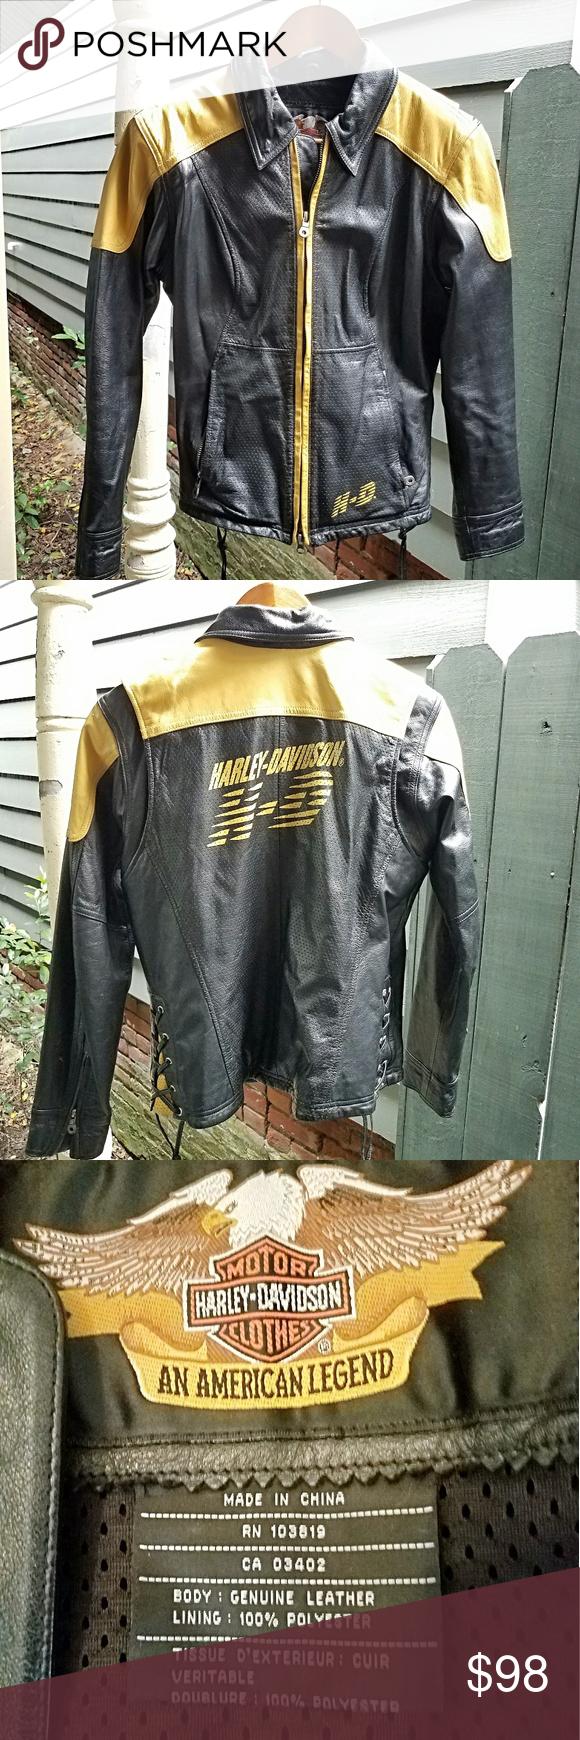 Harley Davidson Black Yellow Leather Jacket Sz S Leather Jacket Yellow Leather Jackets [ 1740 x 580 Pixel ]